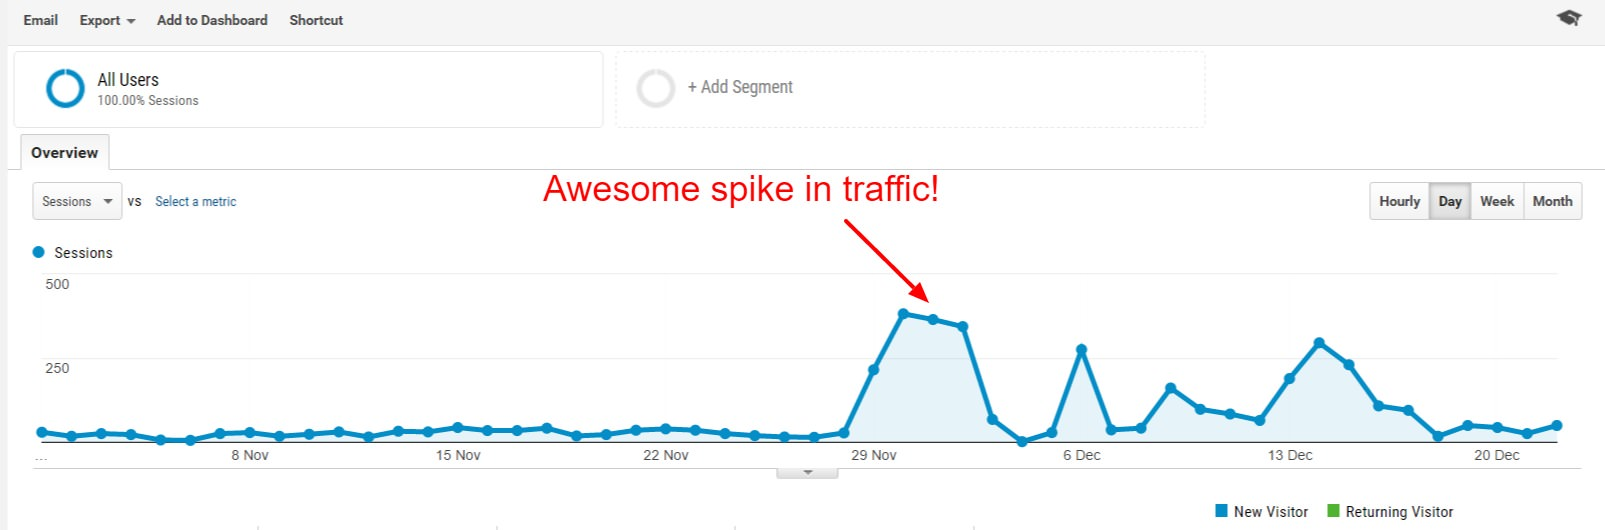 spam traffic